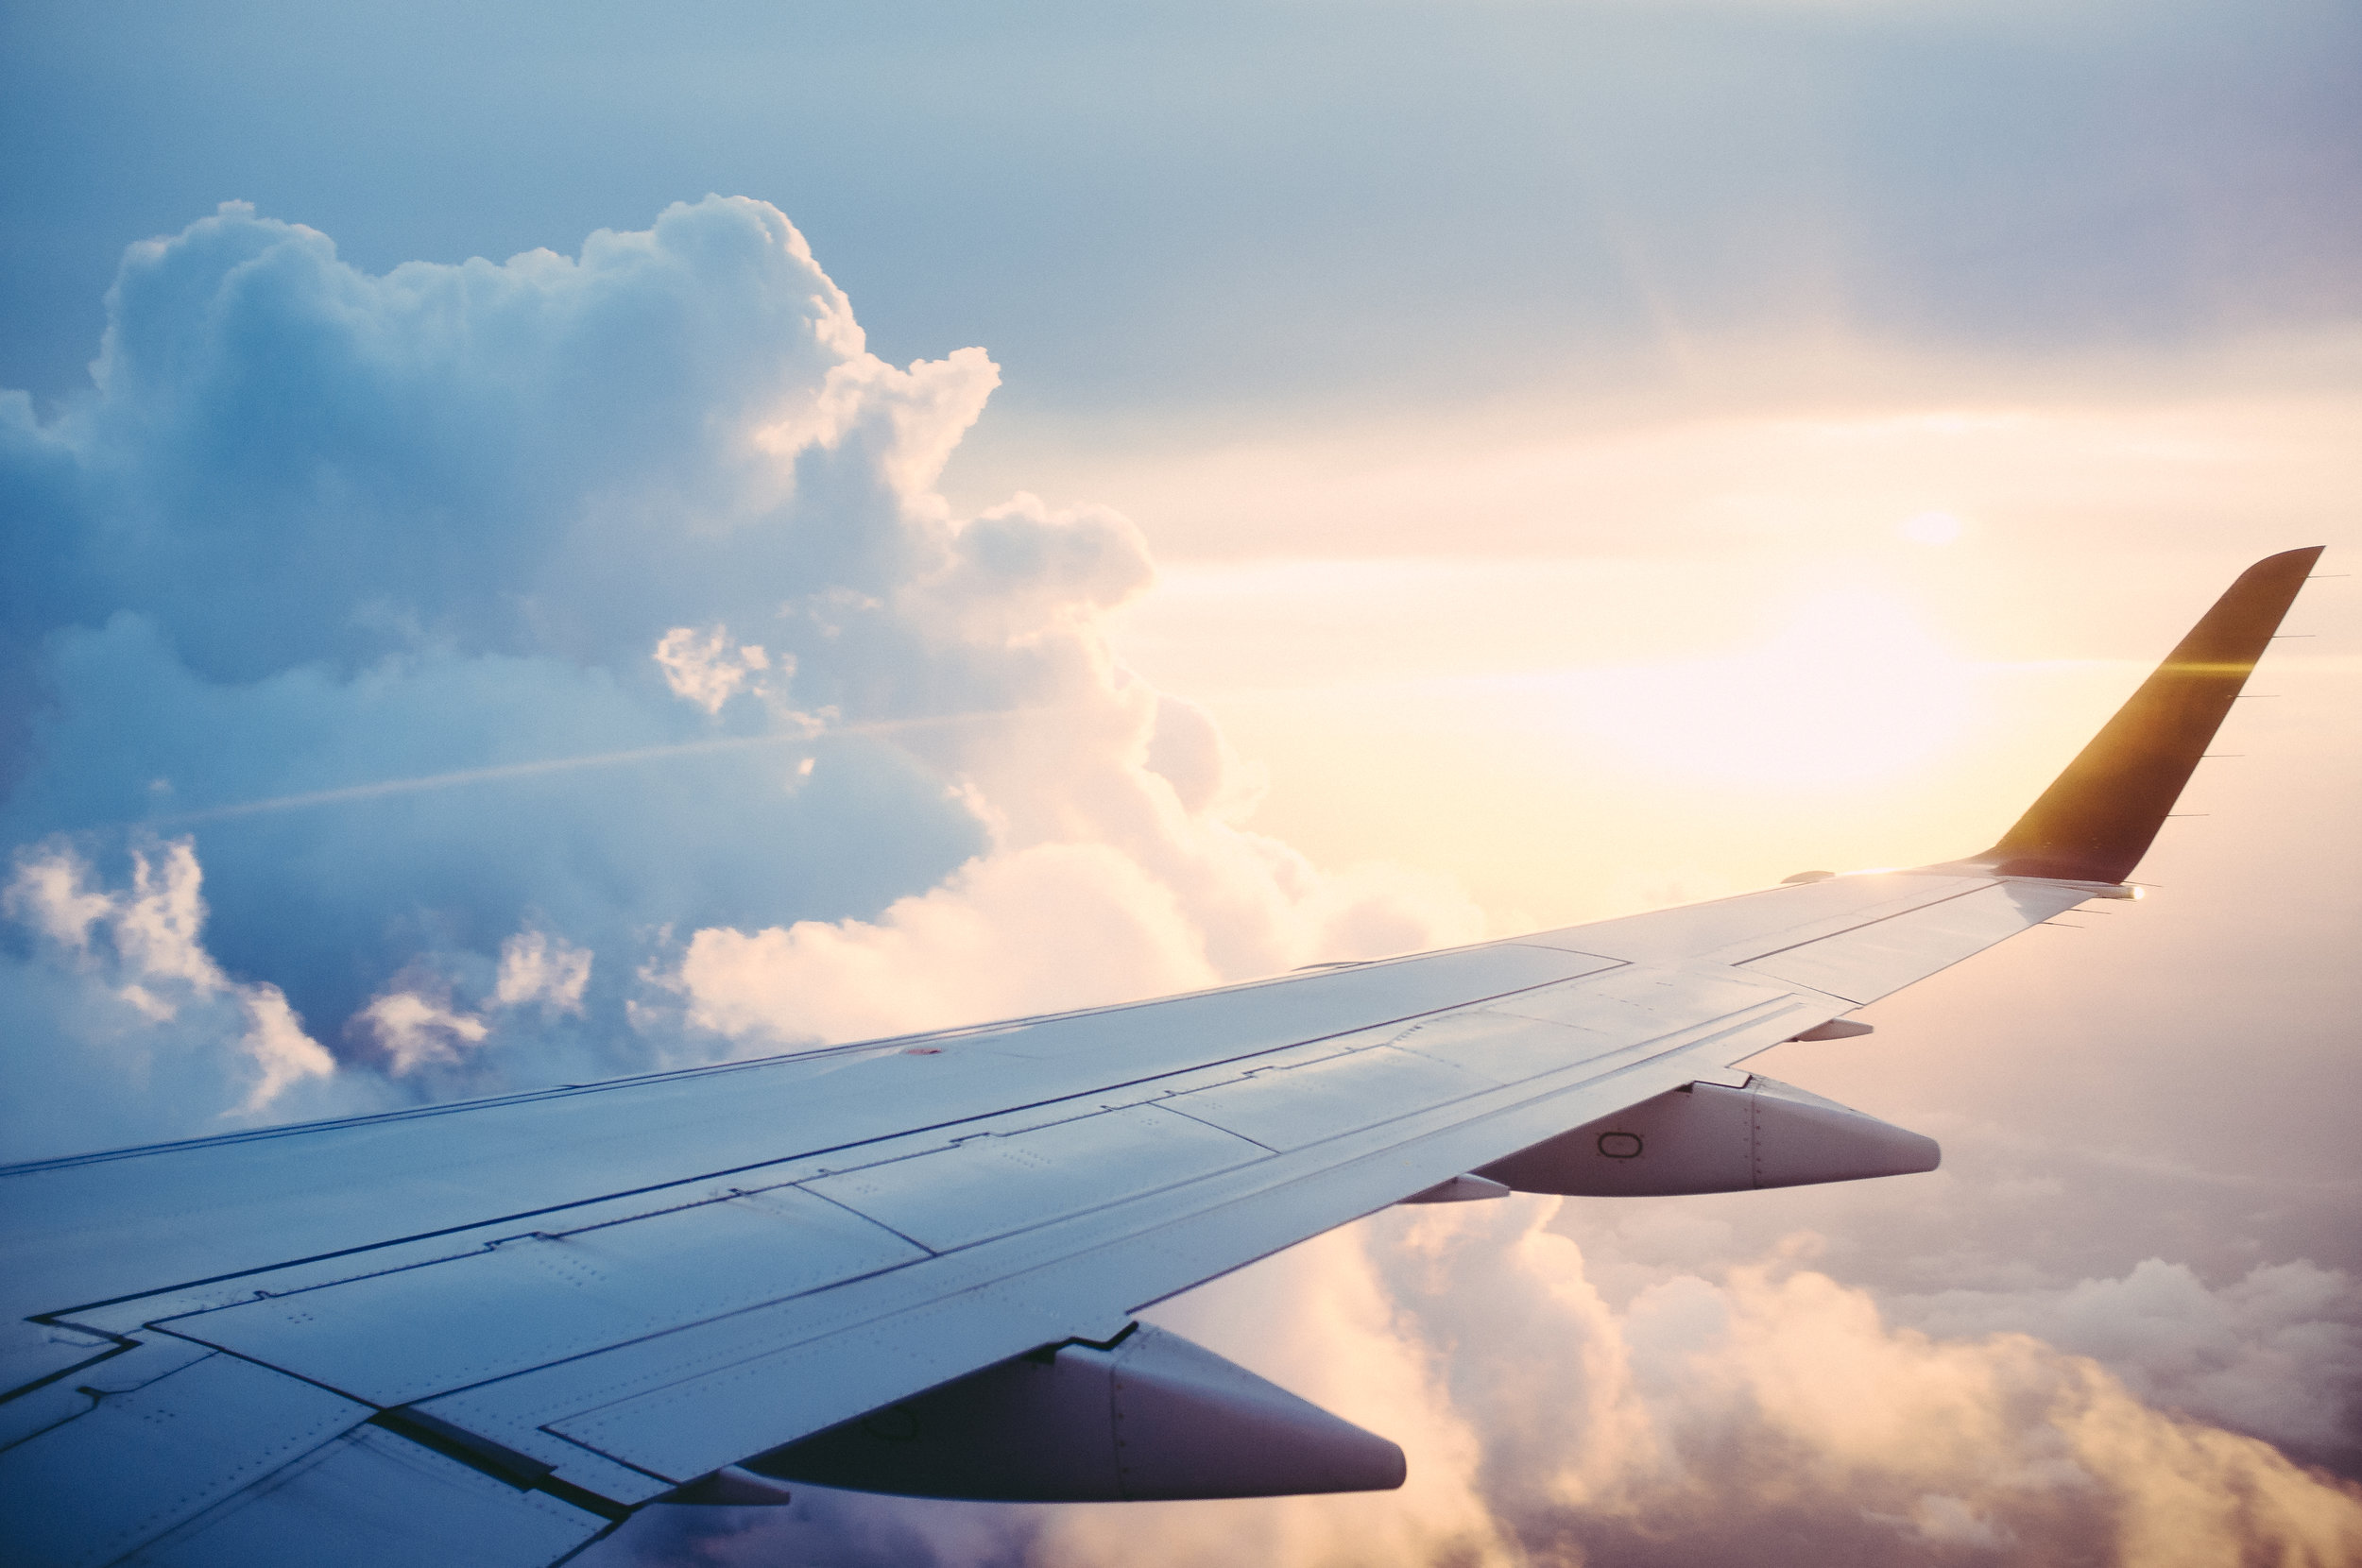 RENT- A FLIGHT SERVICEFOR YOUR VISA APPLICATIONS IN UNITED KINGDOM, CANADA, SCHENGEN, AUSTRALIA, NEW ZEALAND, JAPAN AND SOUTH KOREA. -